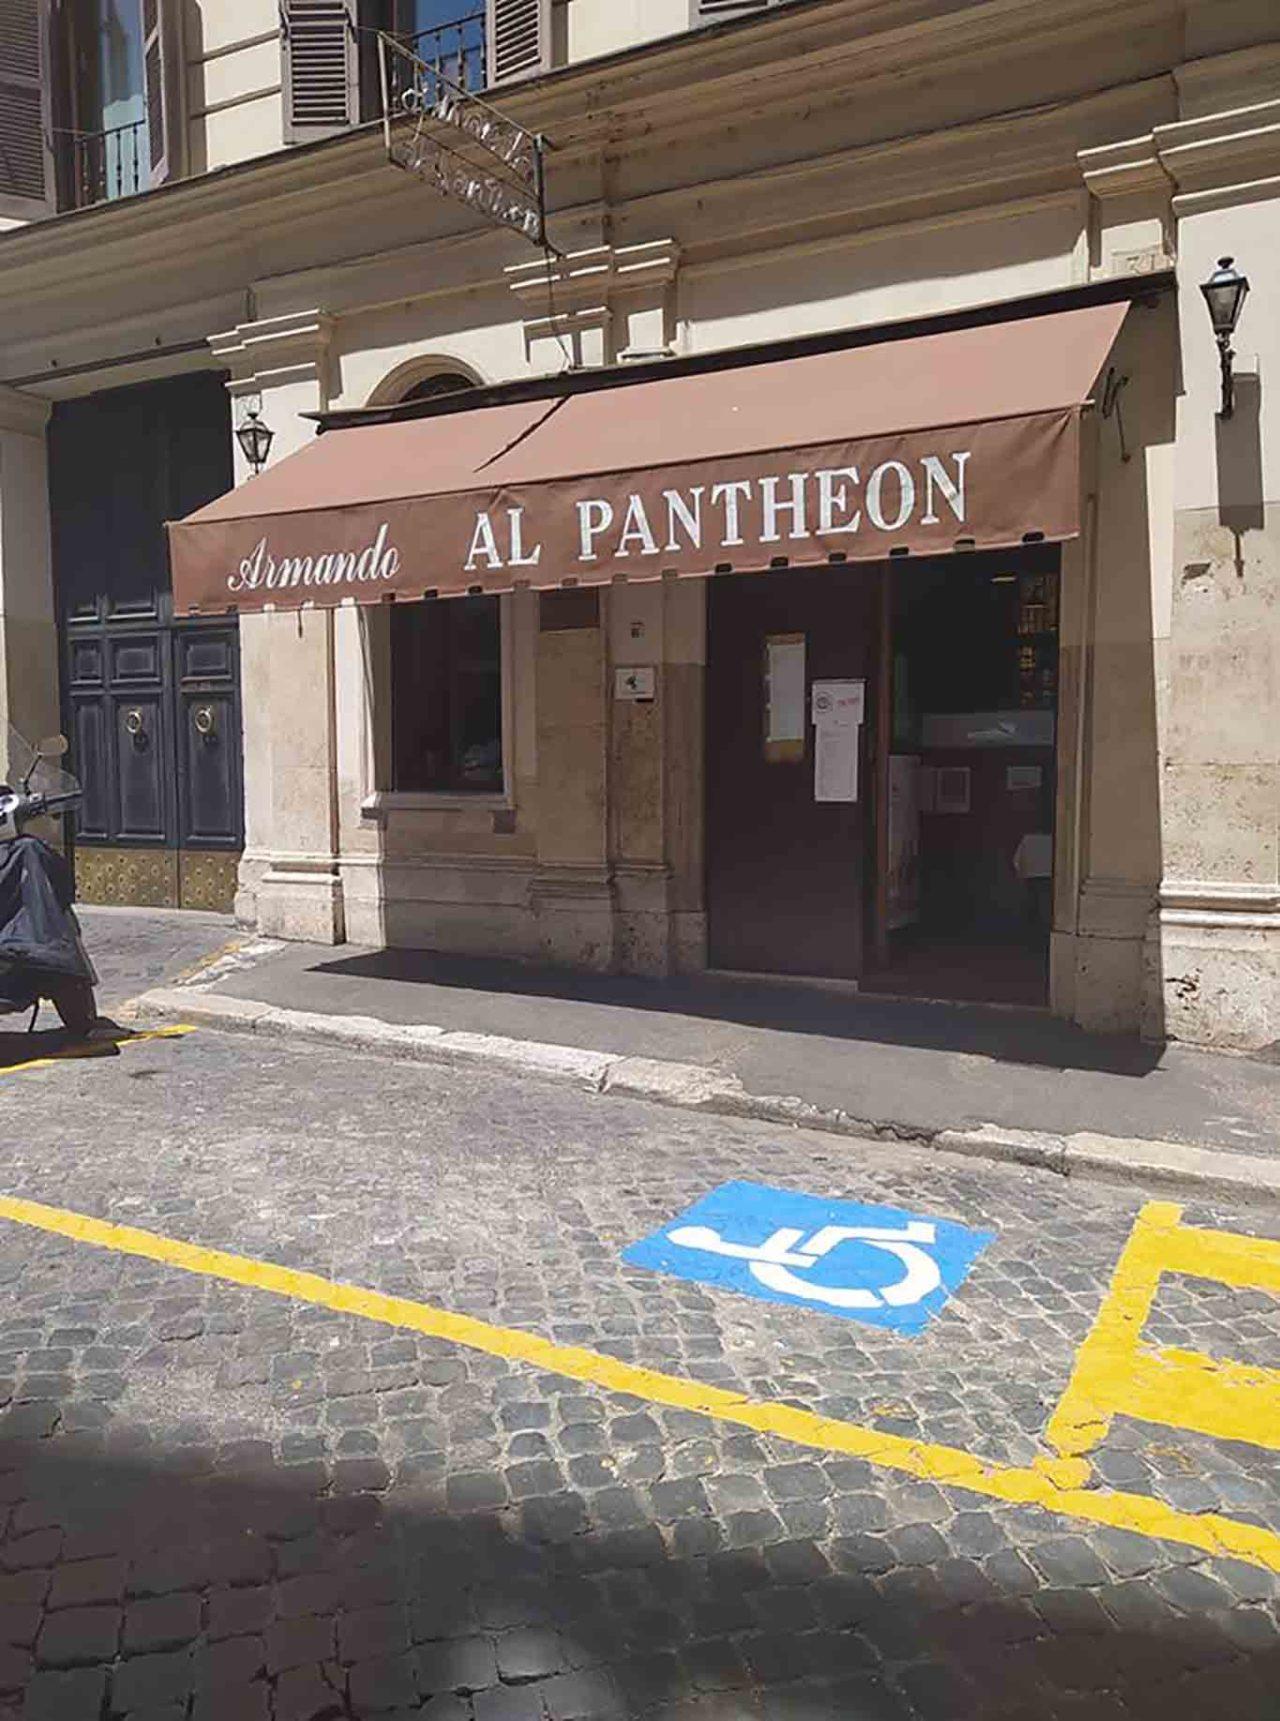 dehors parcheggio disabili Armando al Pantheon